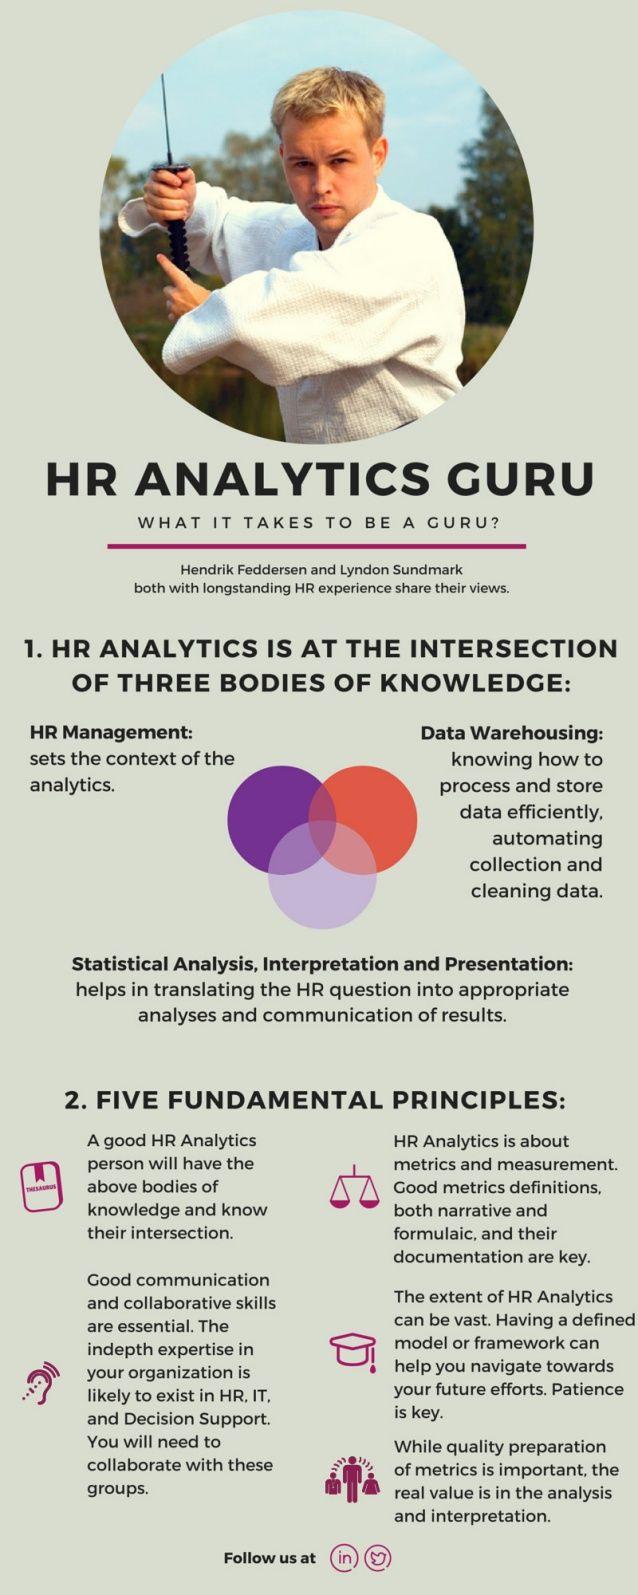 Hr Analytics Guru by Hendrik Feddersen and Lyndon Sundmark